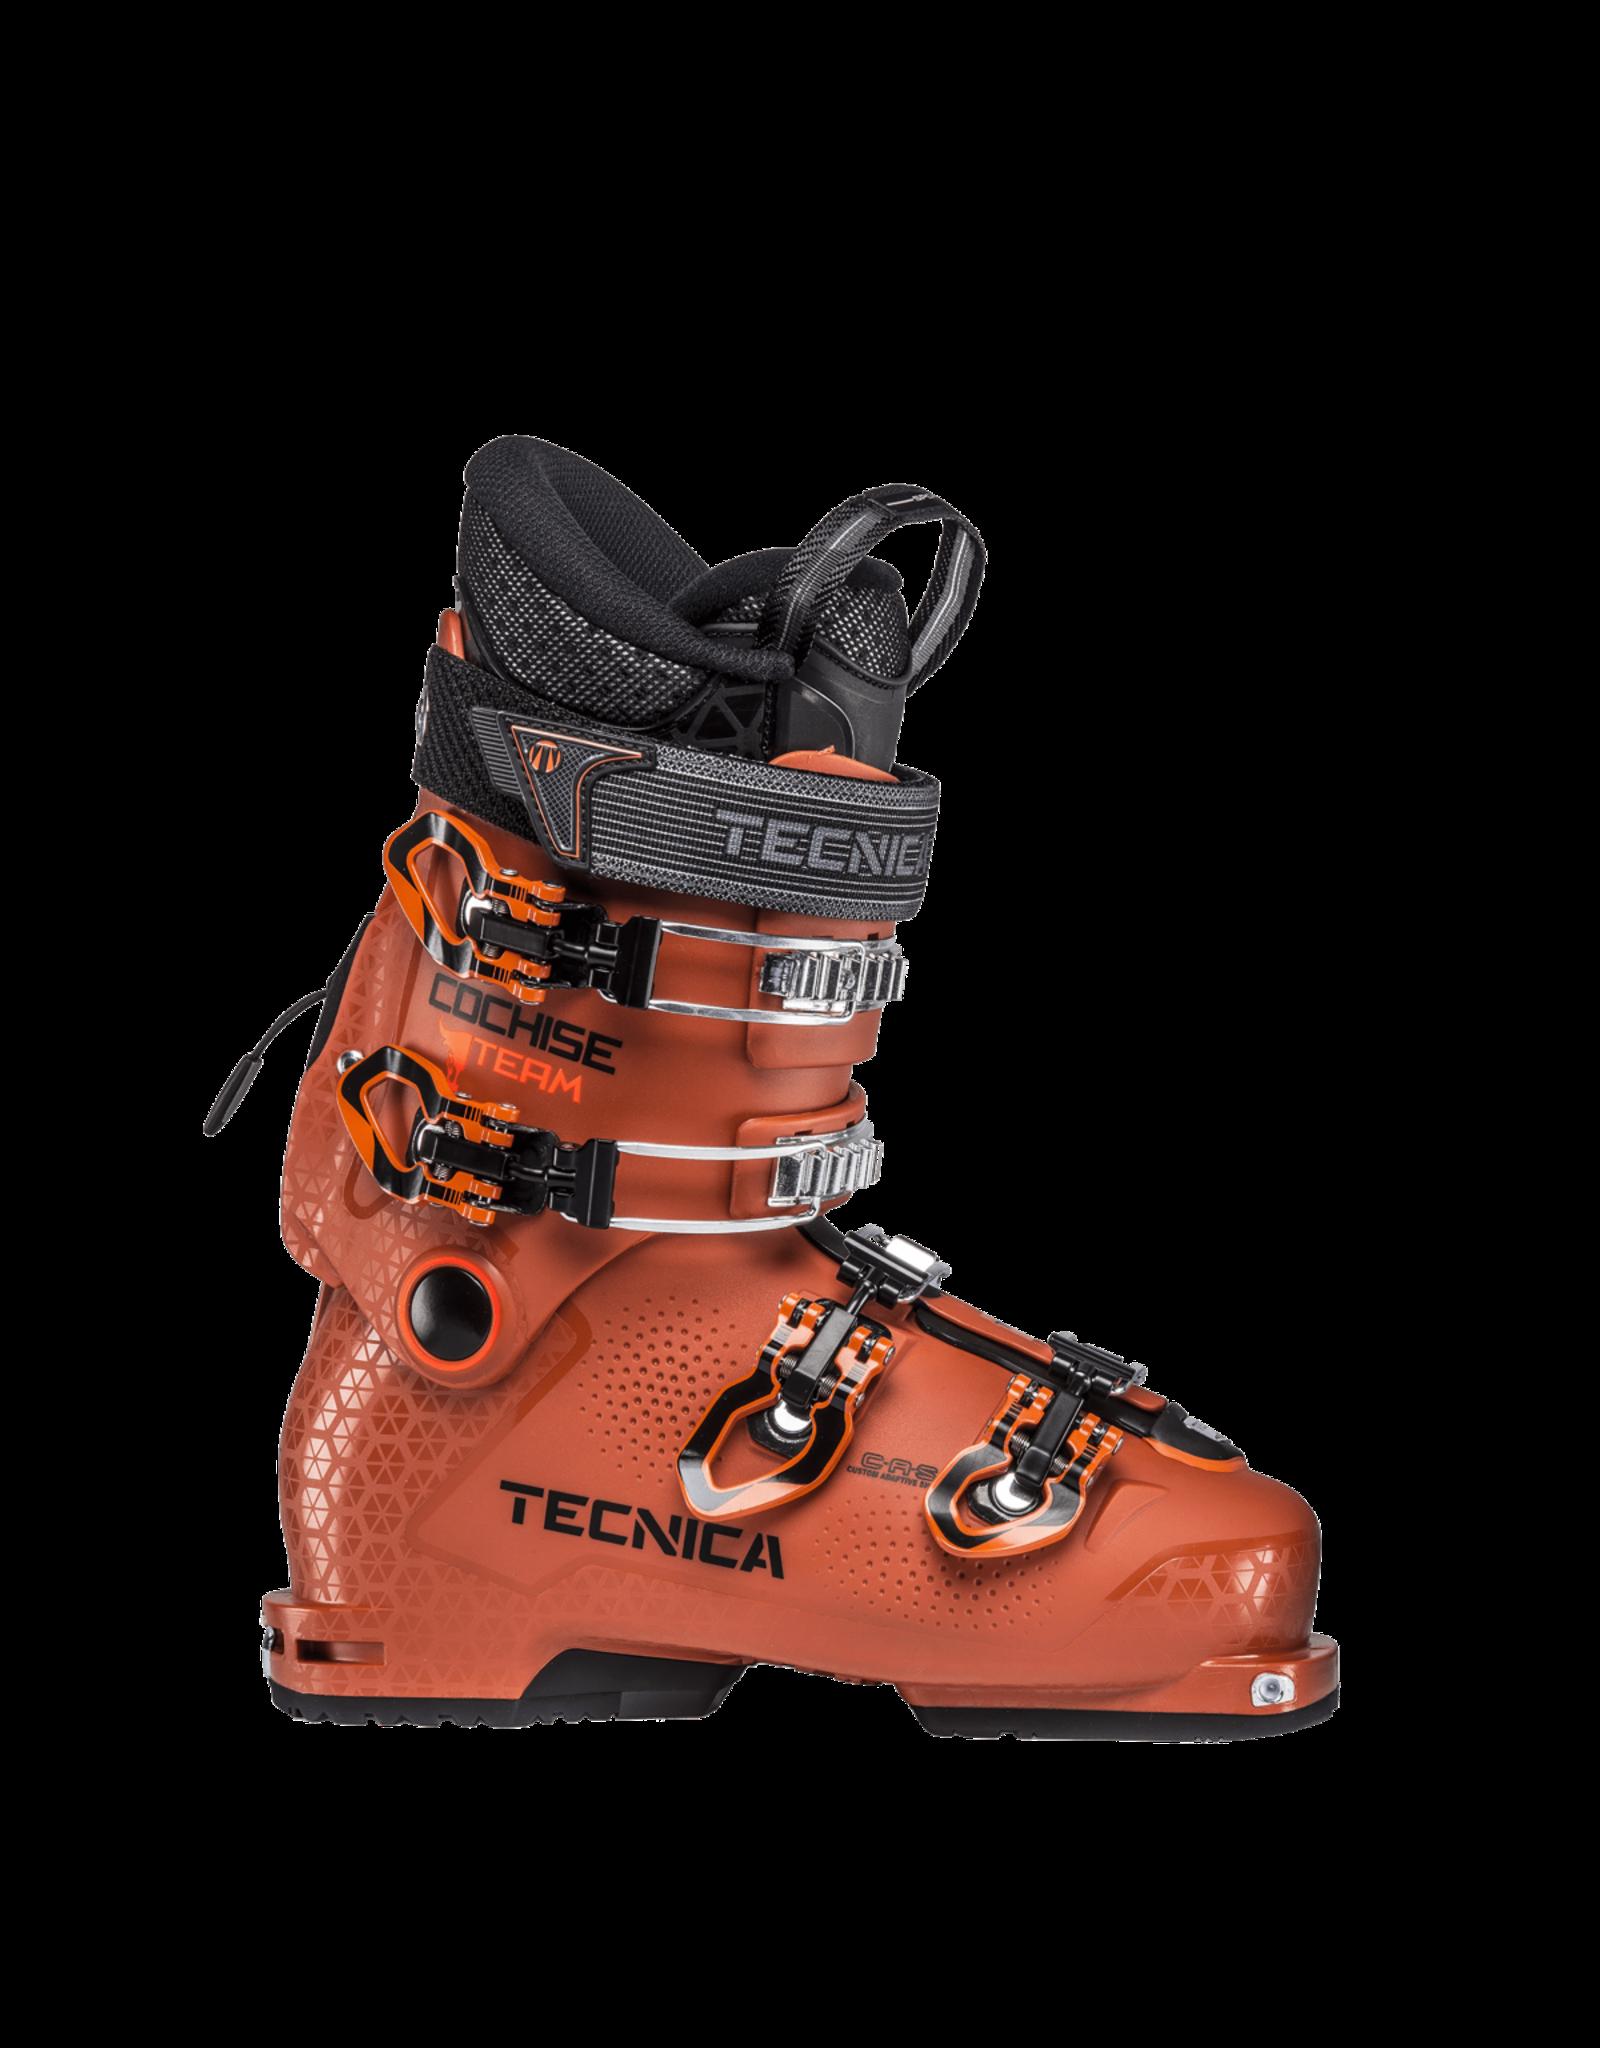 Tecnica Botte de ski Tecnica Cochise Team DYN - Junior